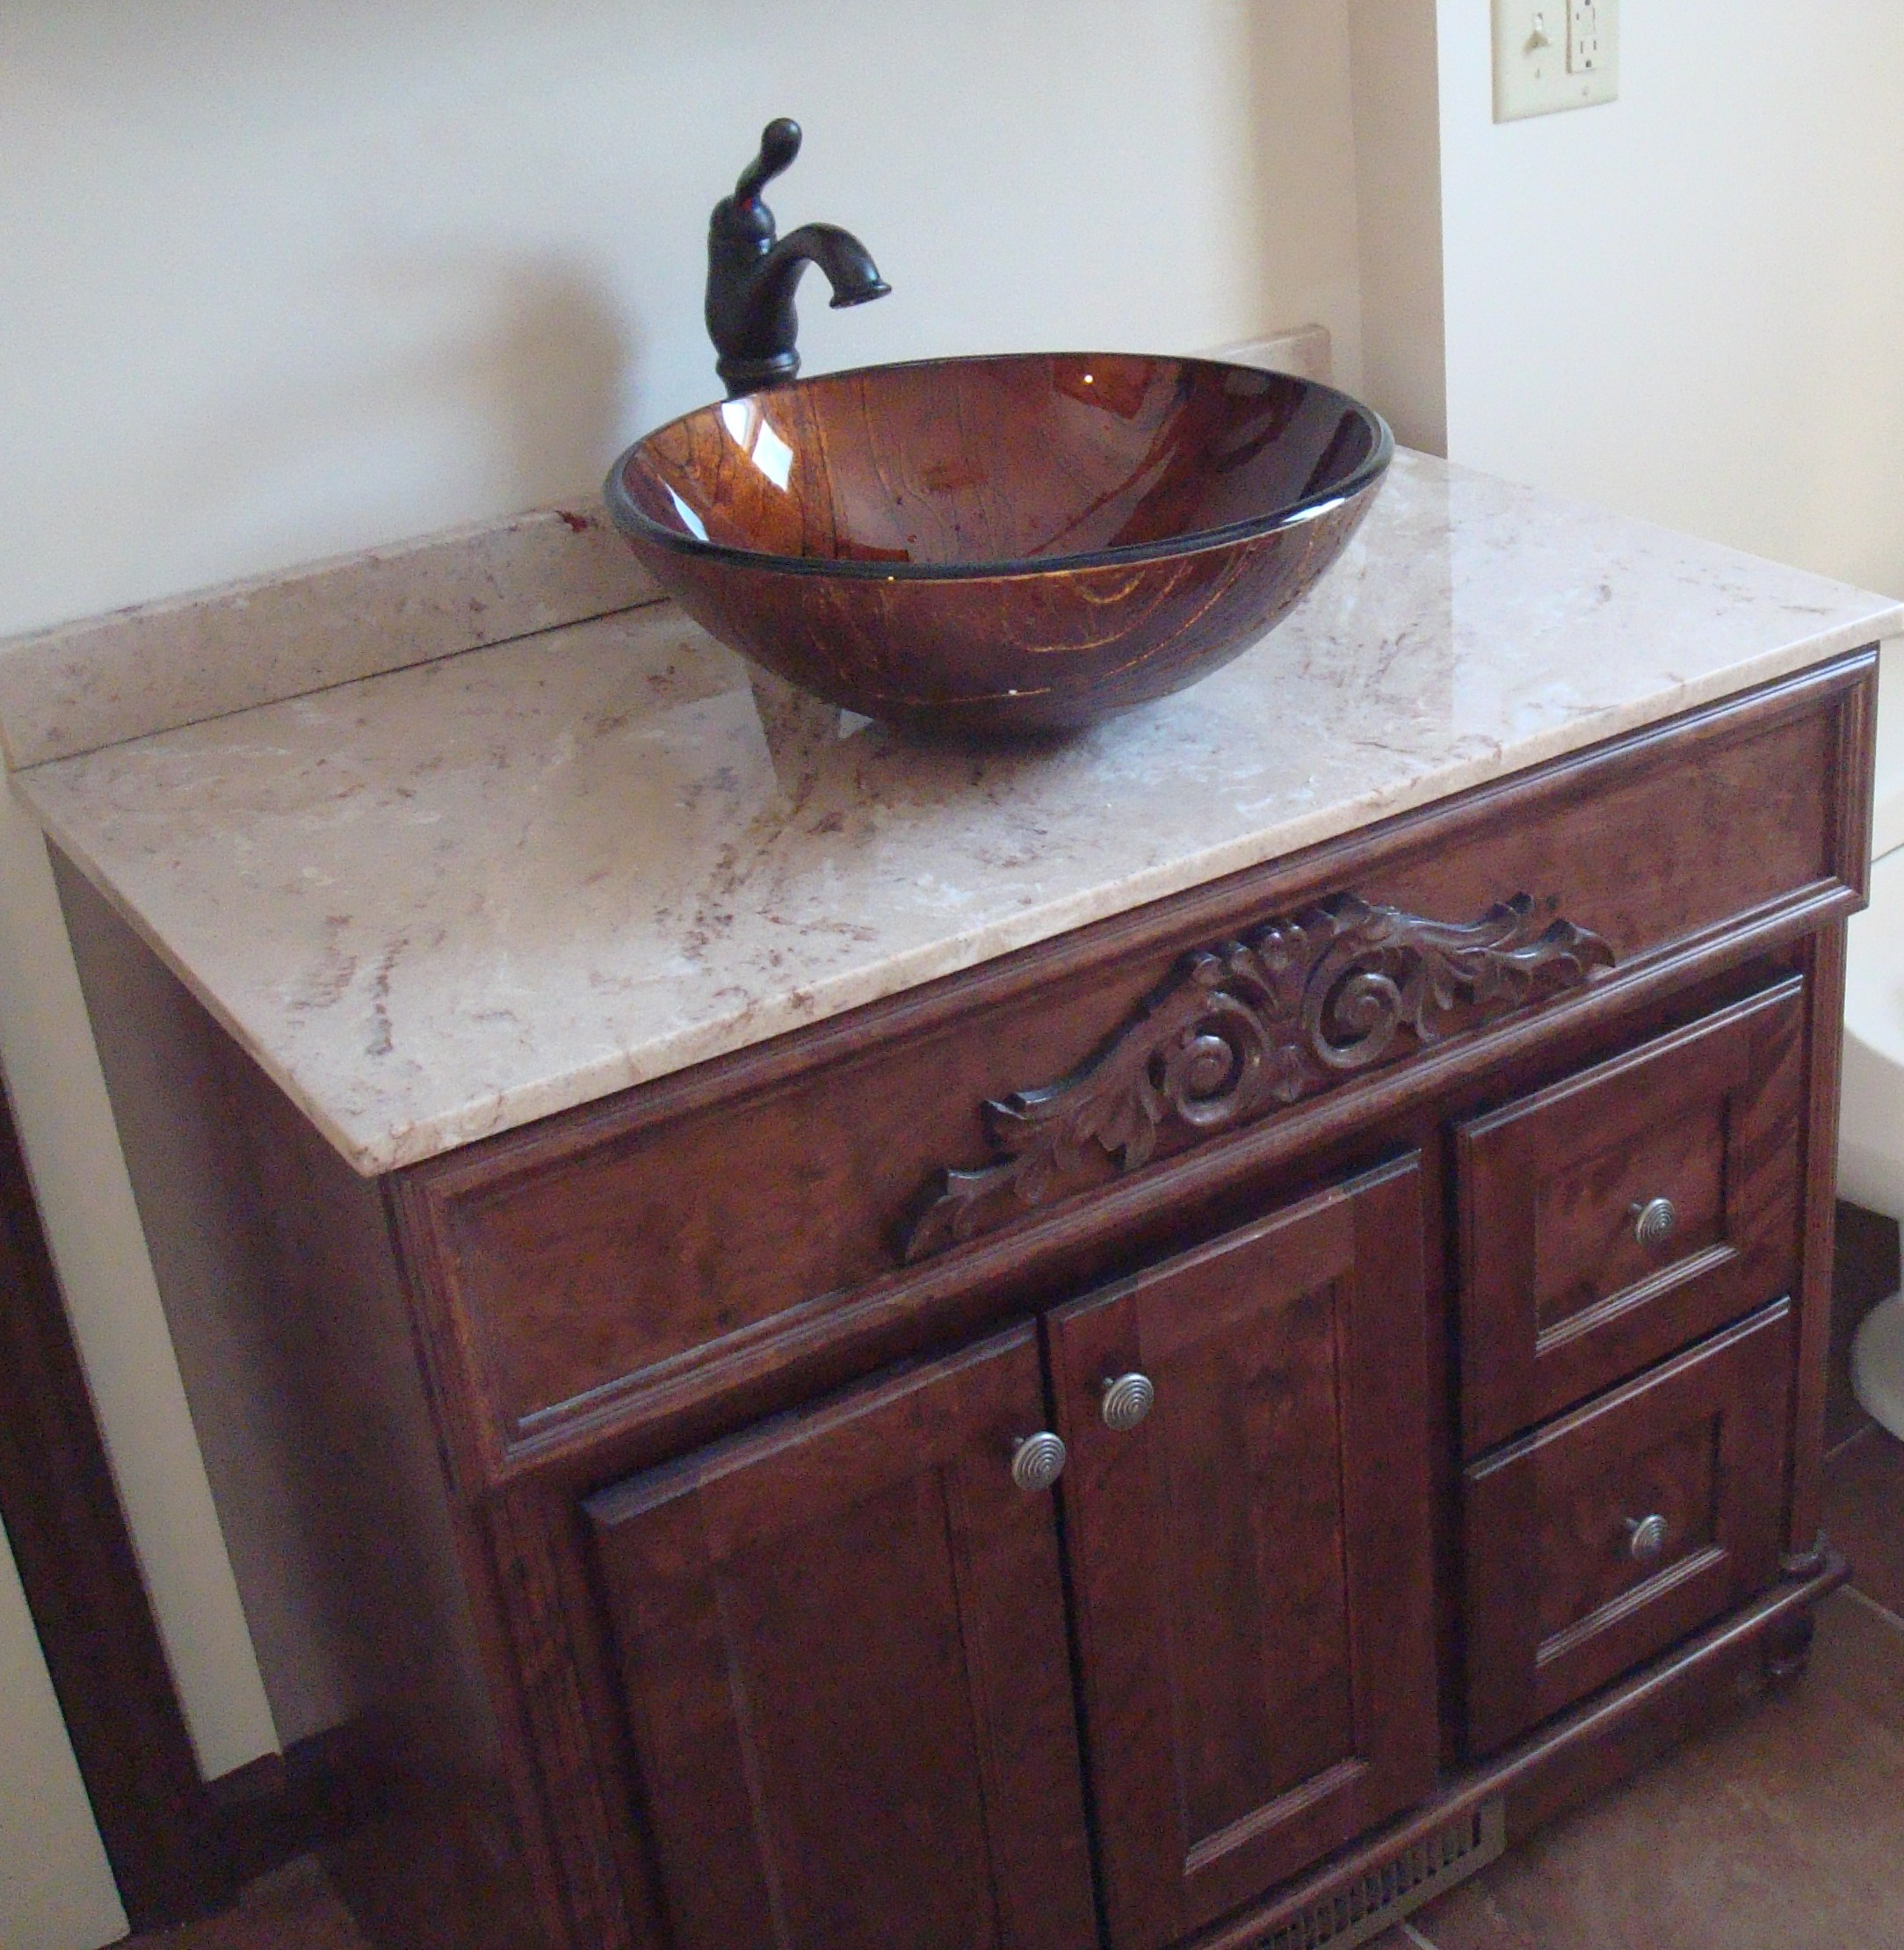 Kitchen Renovation Tax Deduction: Bathroom Remodeling